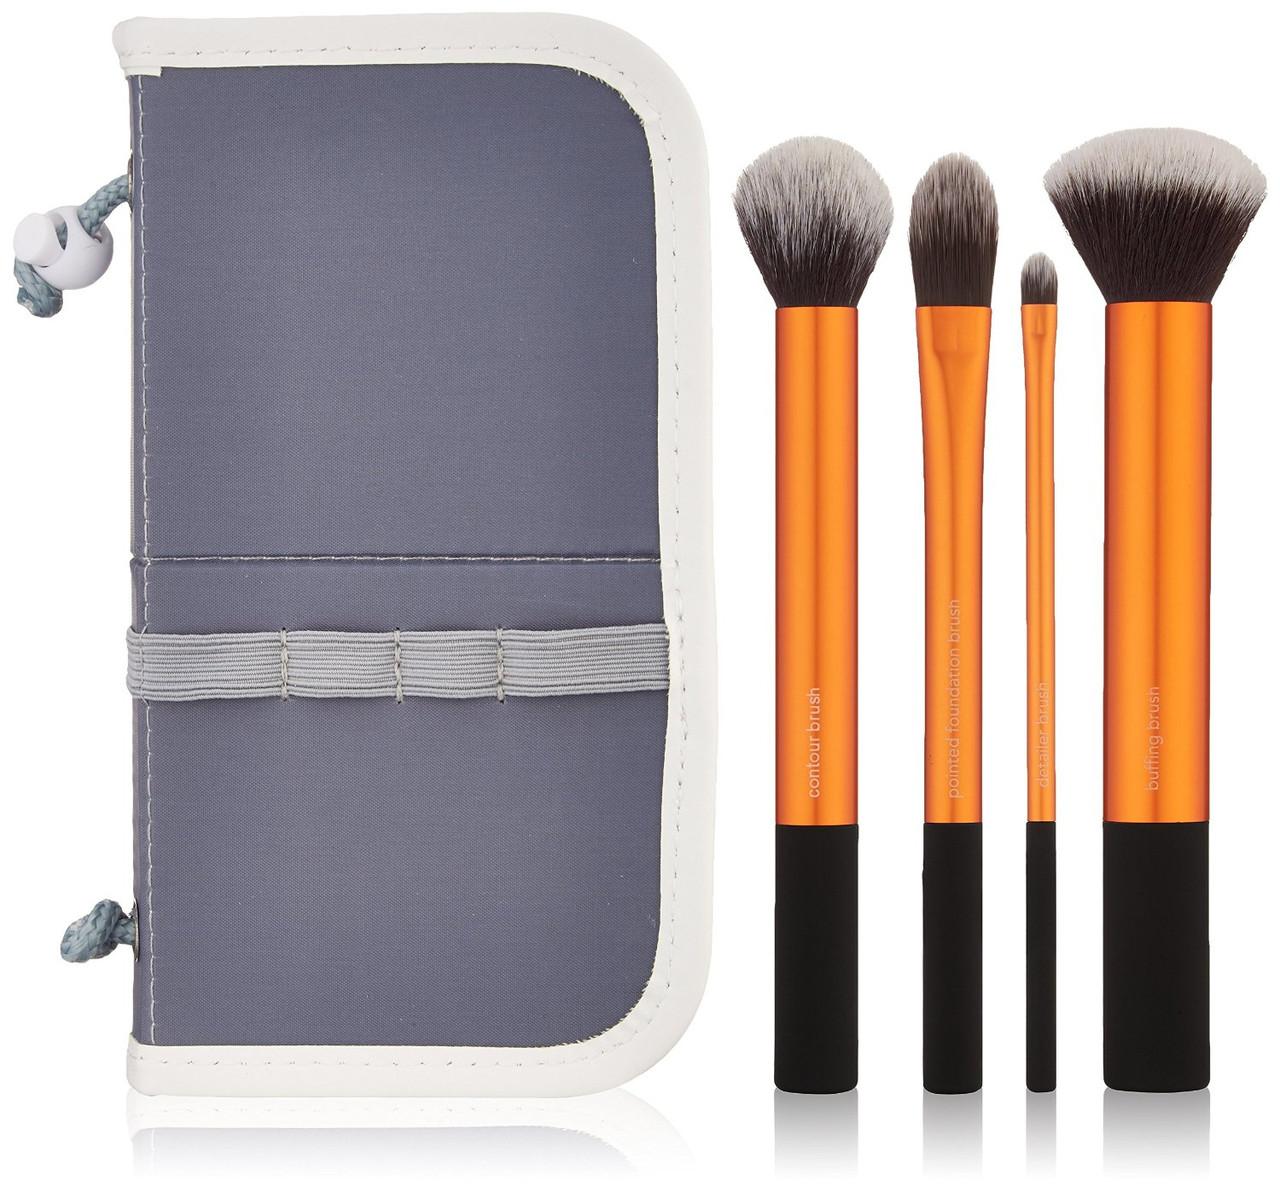 Real Techniques Core Collection набор кистей для макияжа + чехол